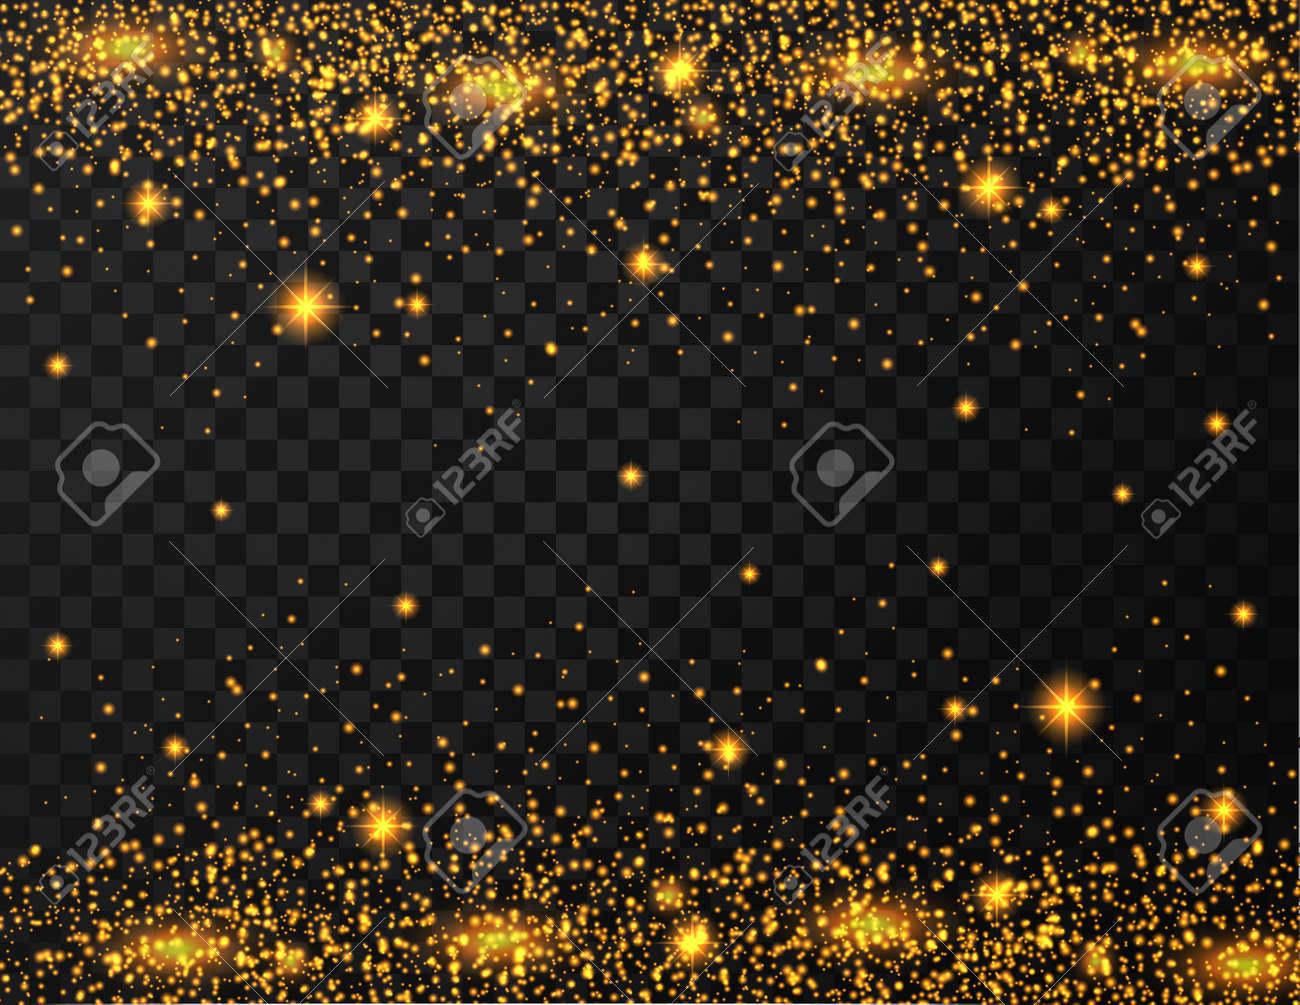 Gold glitter texture on transparent background - 168266519